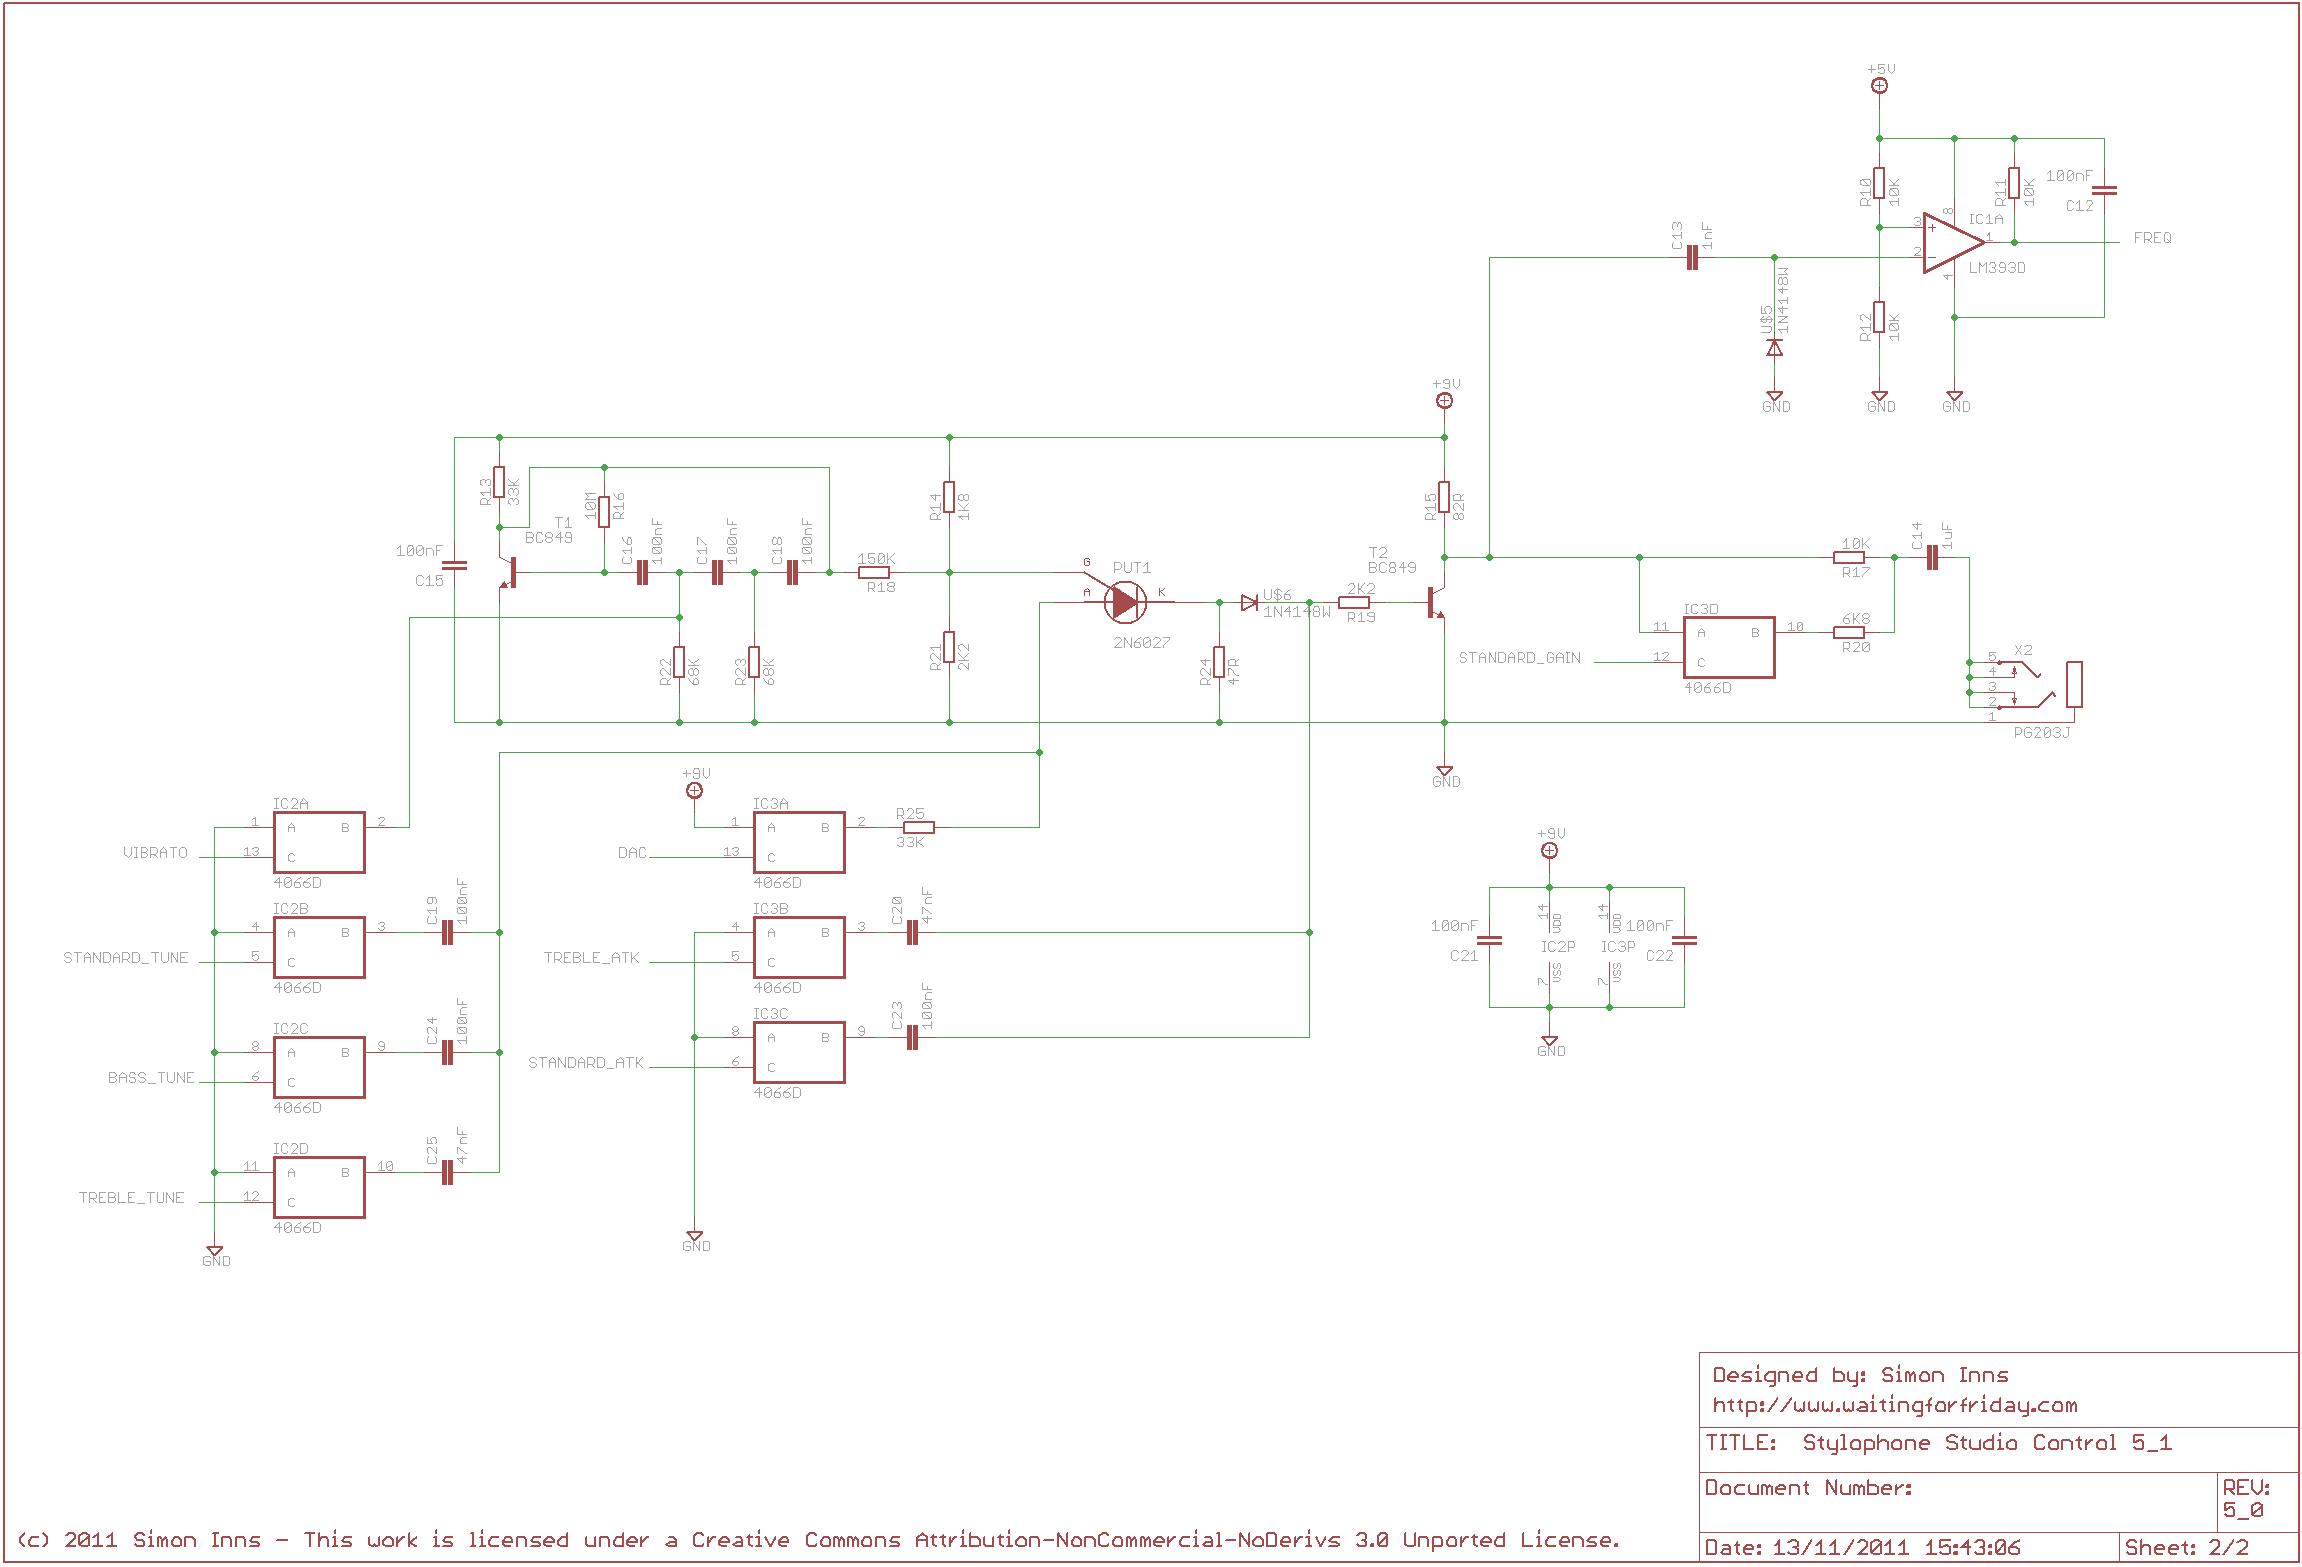 Surf Sound Generator Circuit Diagram Electrical Wiring Diagrams Cuckoo Schematic Eeweb Community Processor In An Acorn Bbc Microcomputer Engine